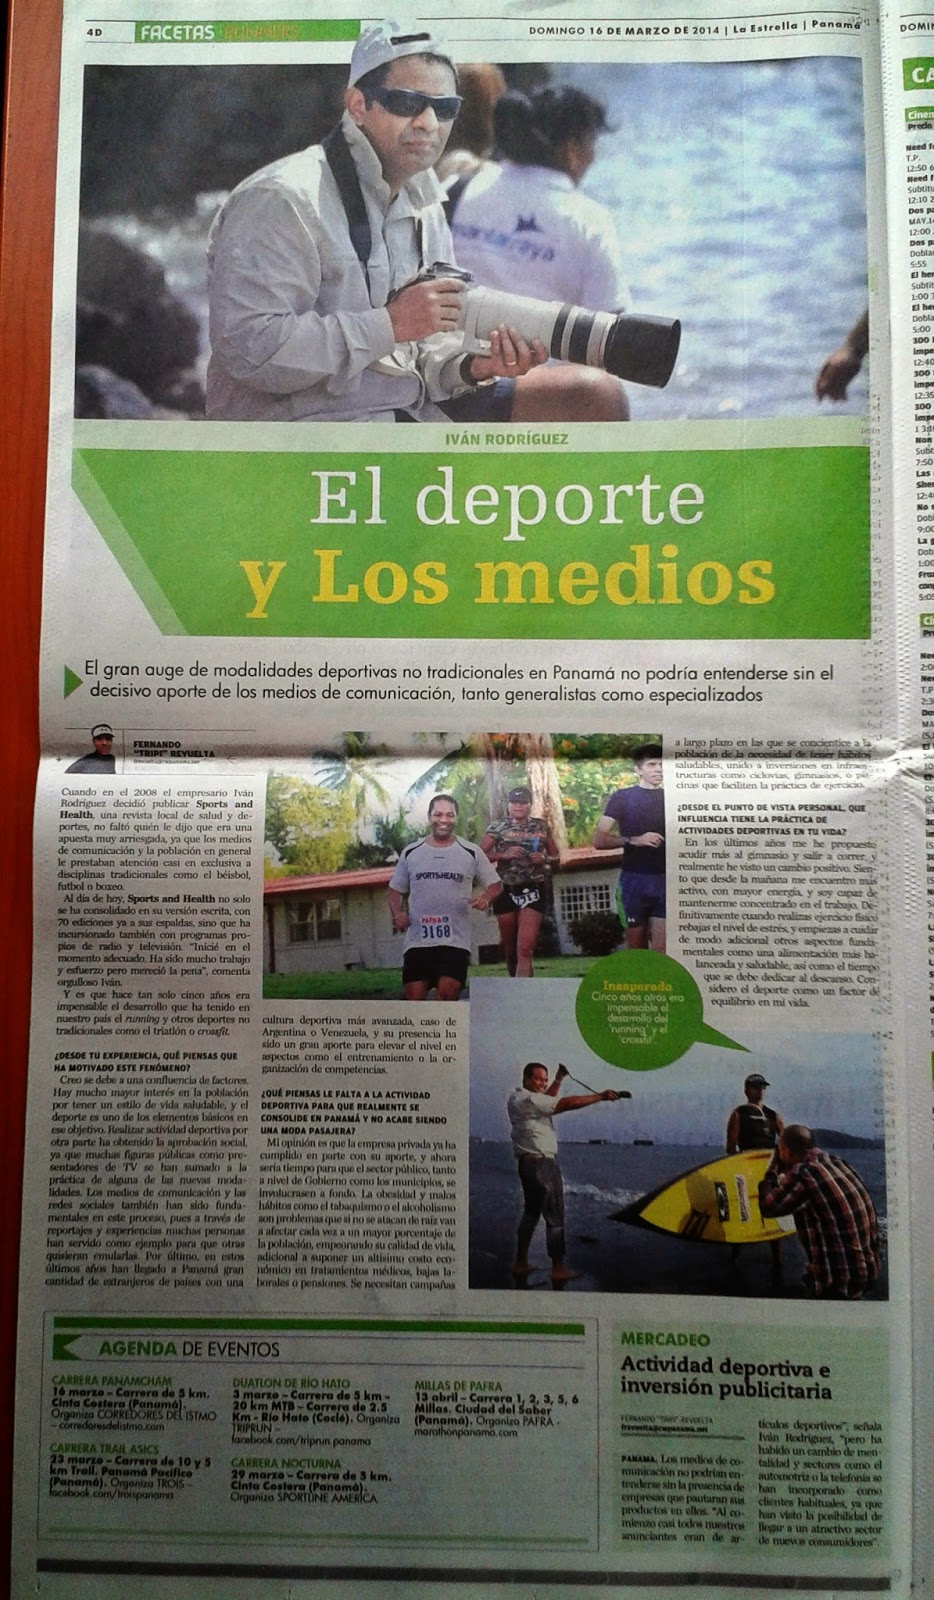 Entrevista a Ivan Rodriguez en La Estrella de Panamá